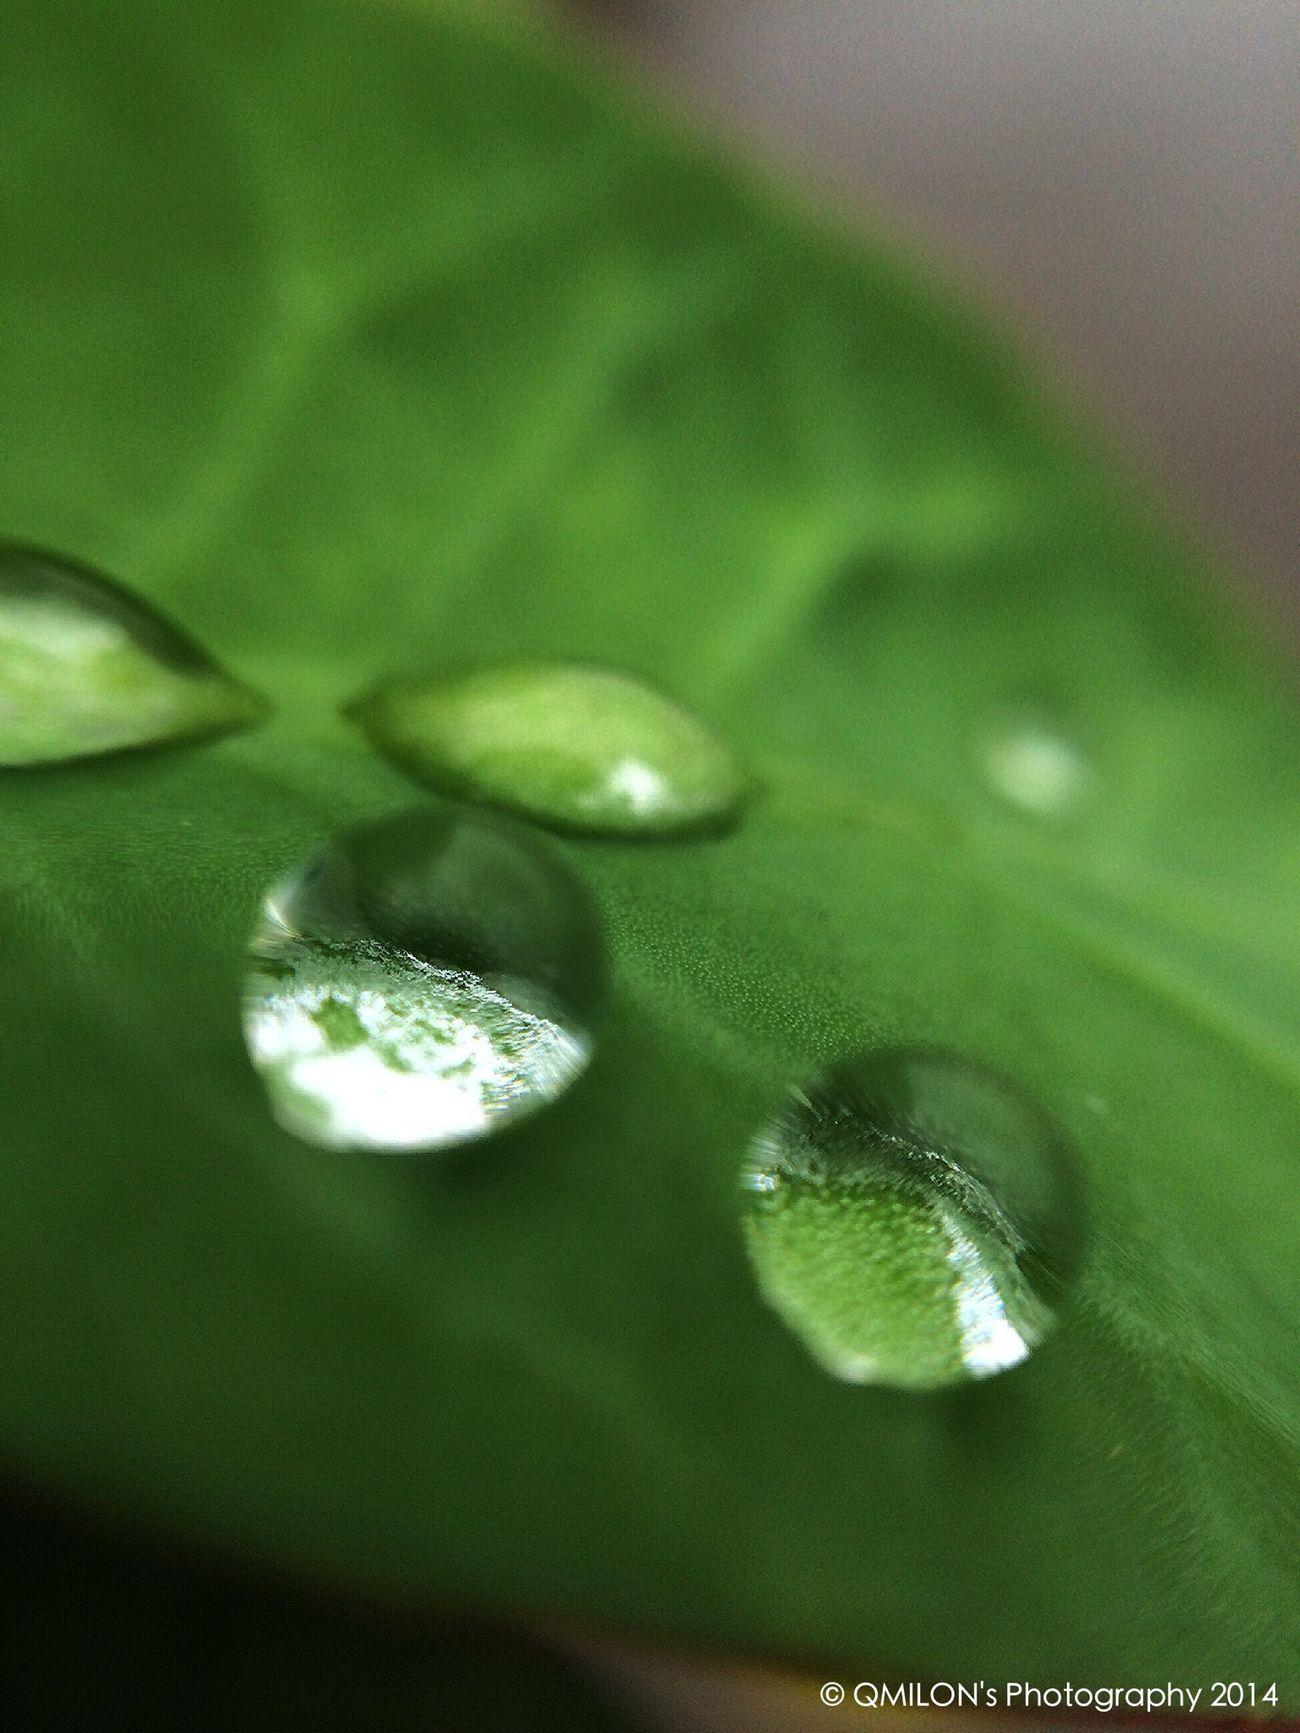 Droplets DropletsCreators Rain Drops Enjoying The Rain Drops